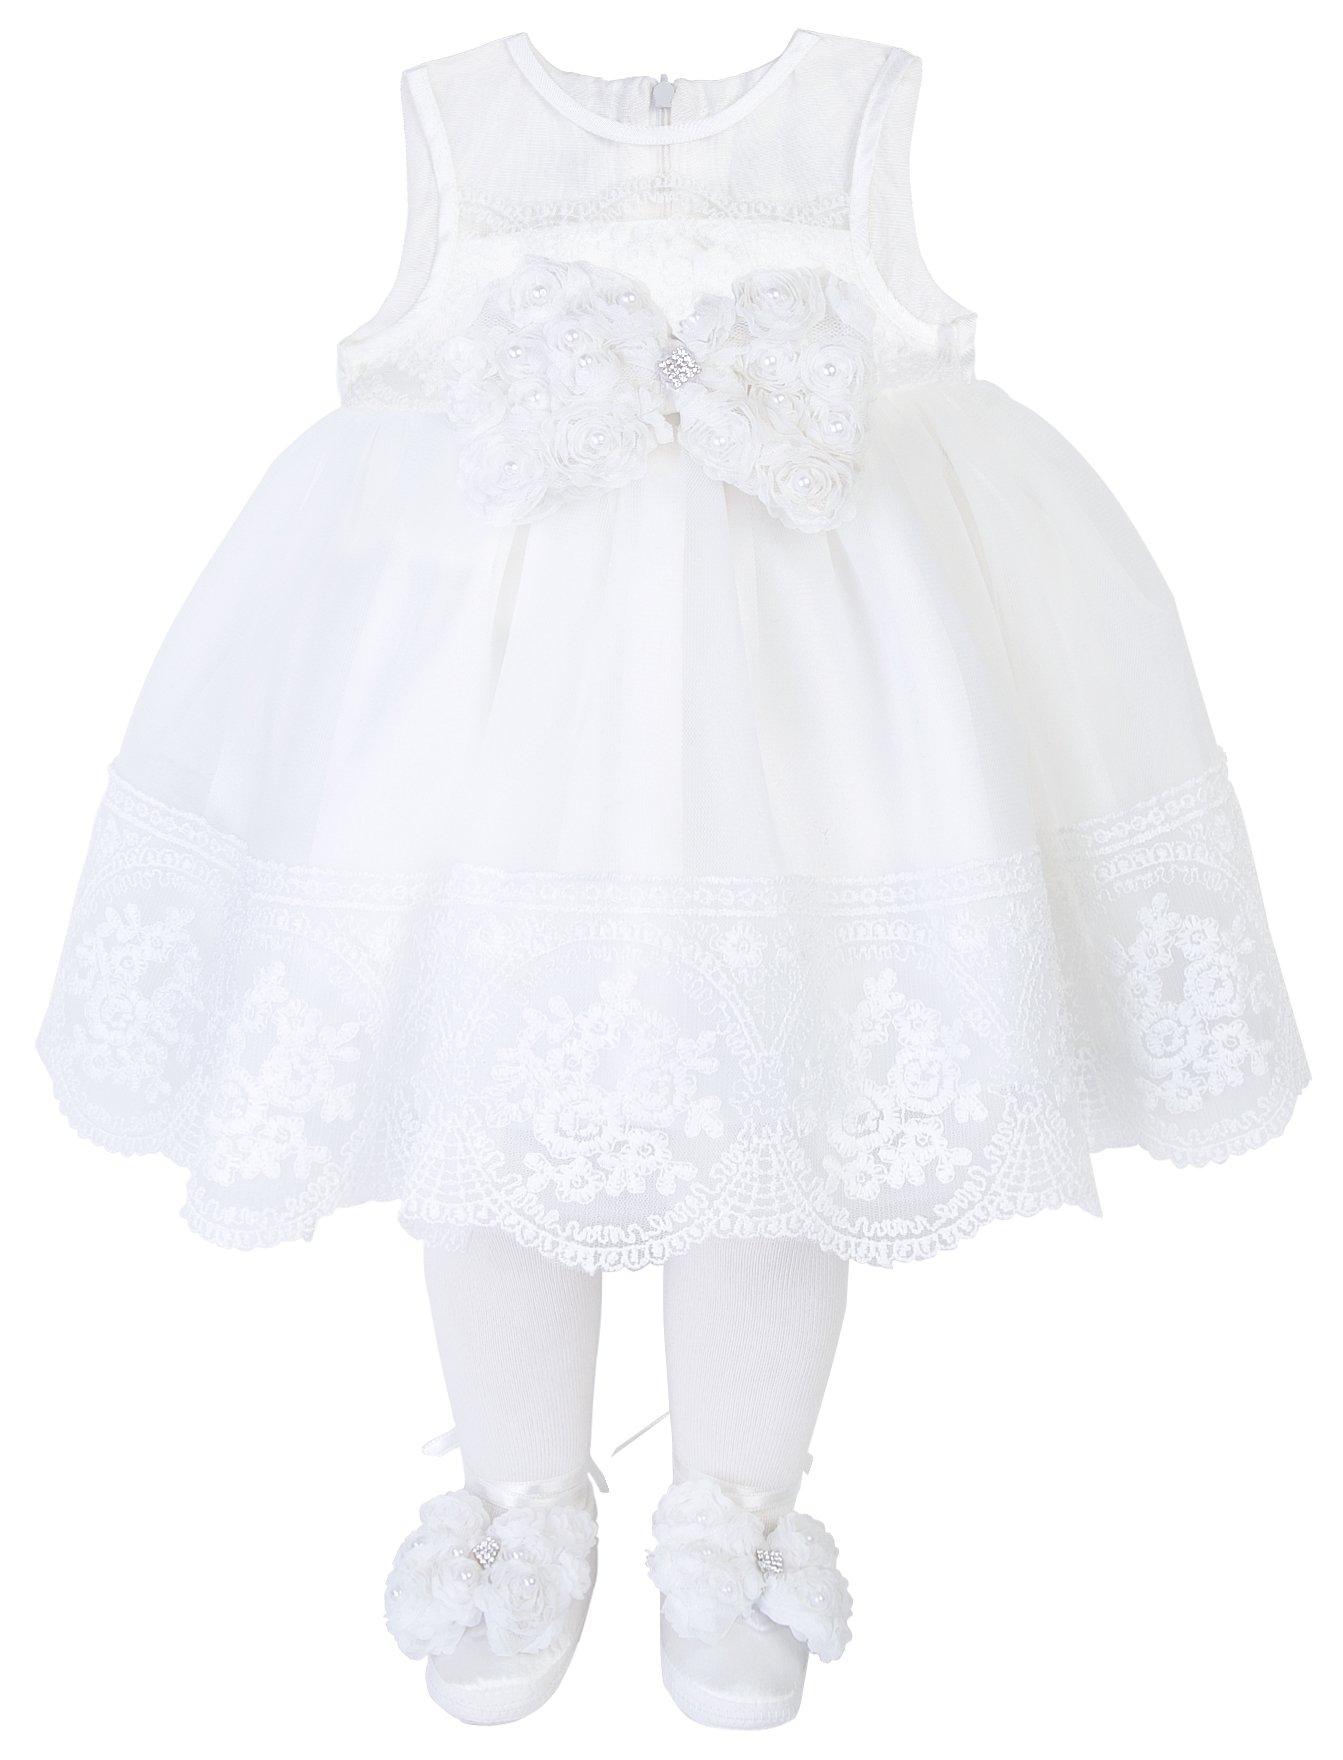 ec15e7bcf1 Taffy Baby Girl Christening Baptism Embroidered Dress Gown 6 Pcs Set 0-3  Months